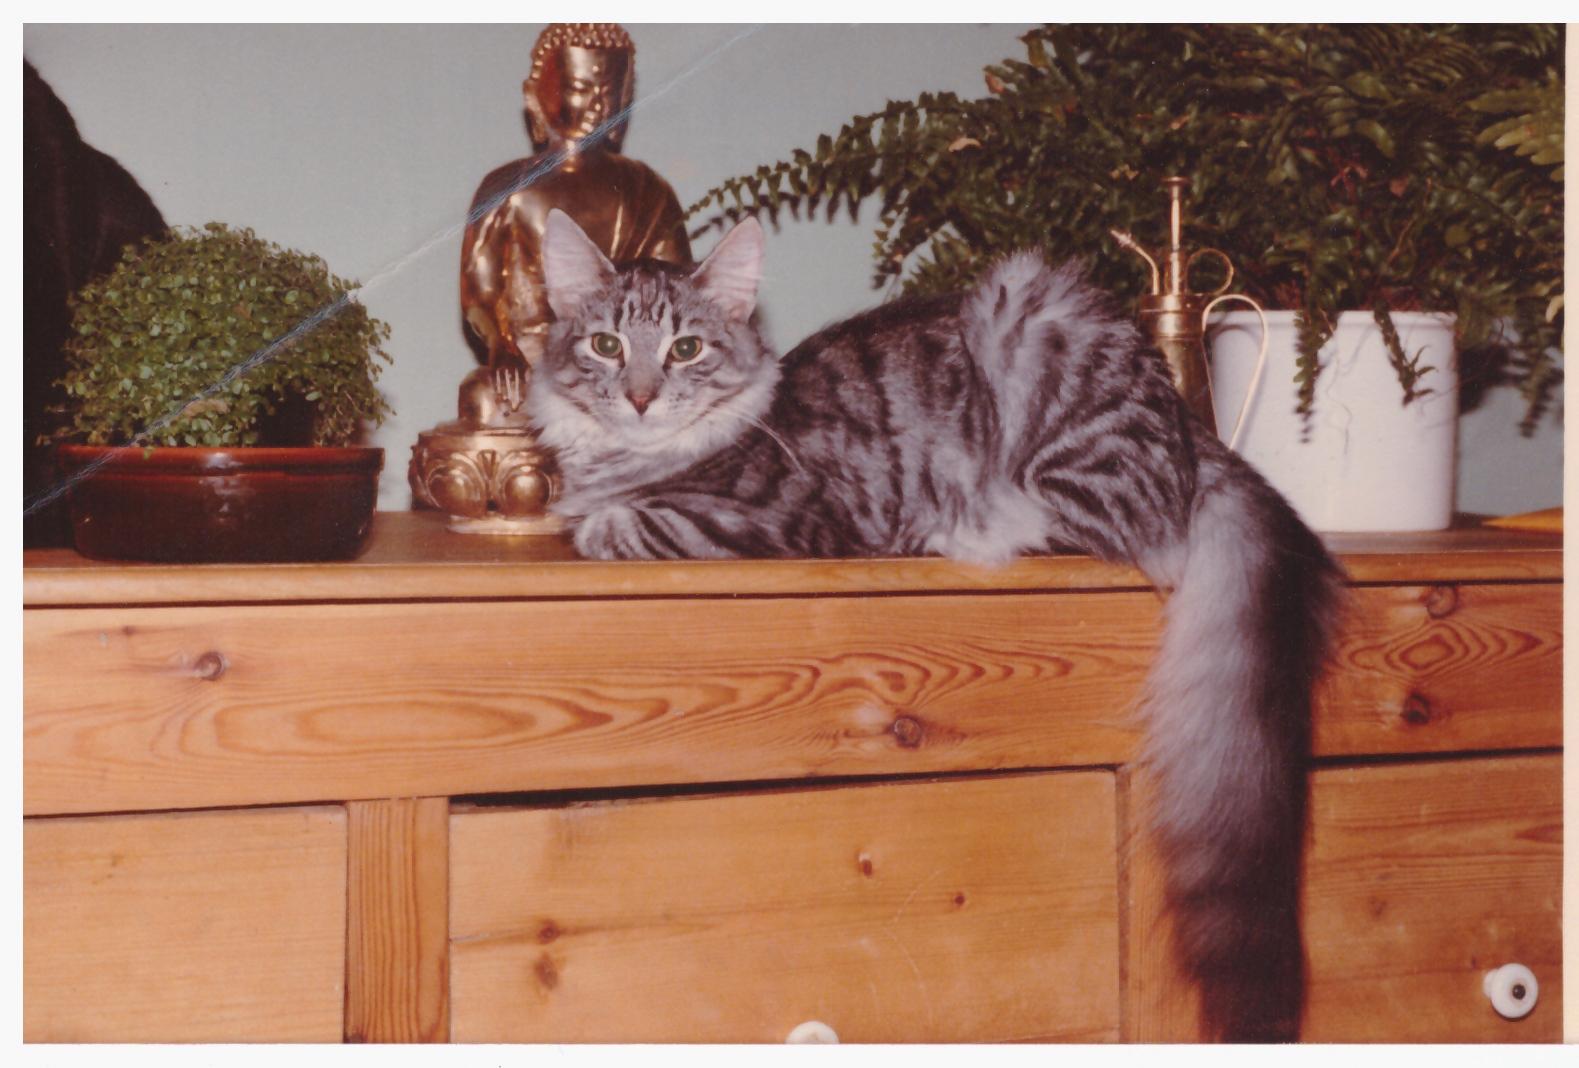 Torvemyra's Grand Soltario 1981